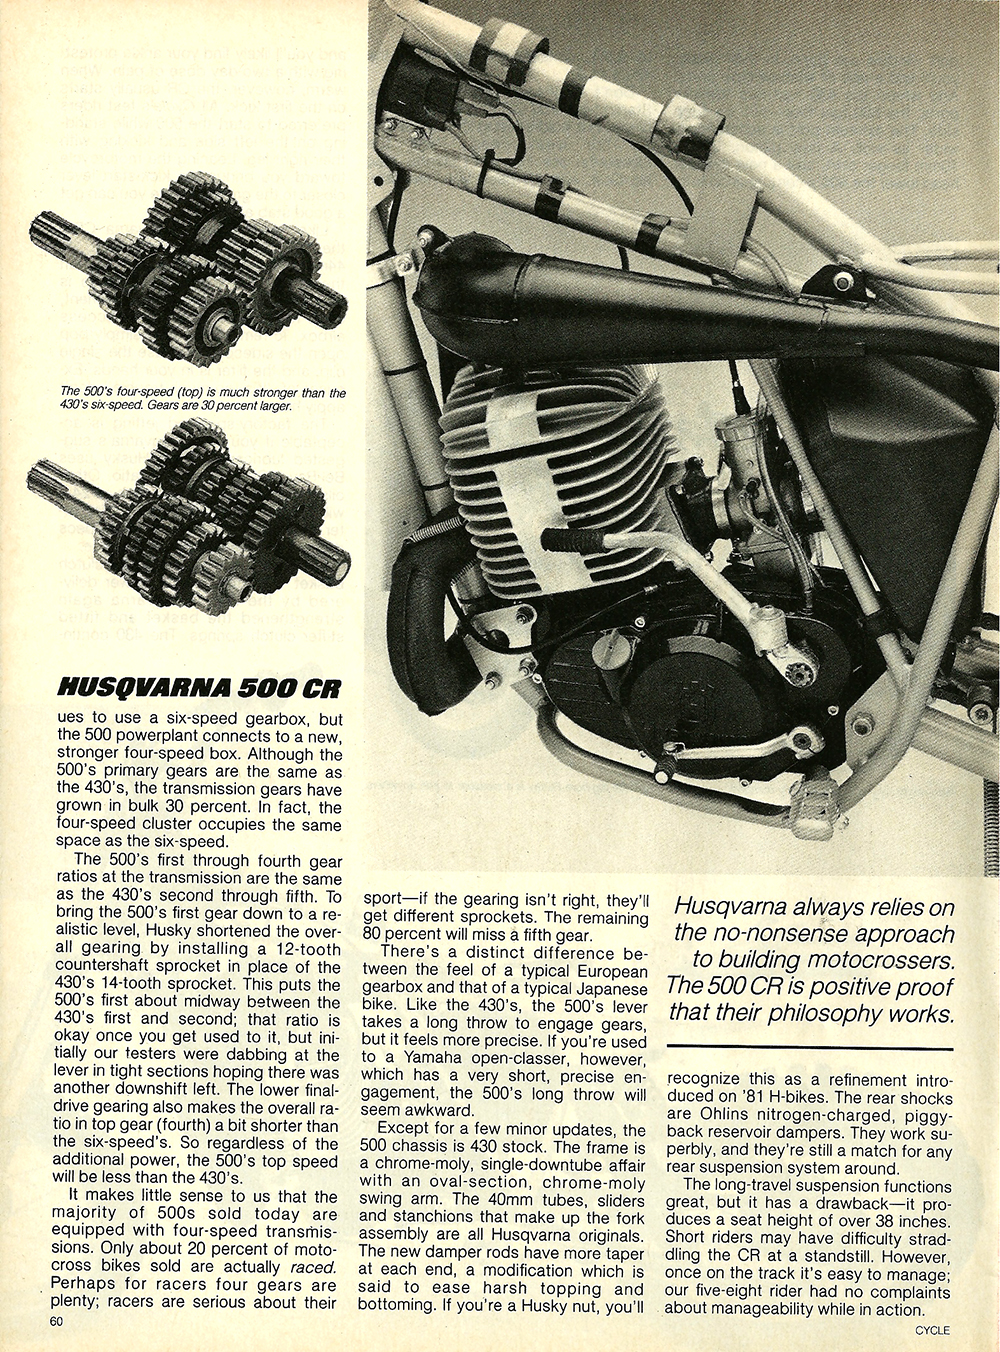 1983 Husqvarna 500 CR road test 5.jpg